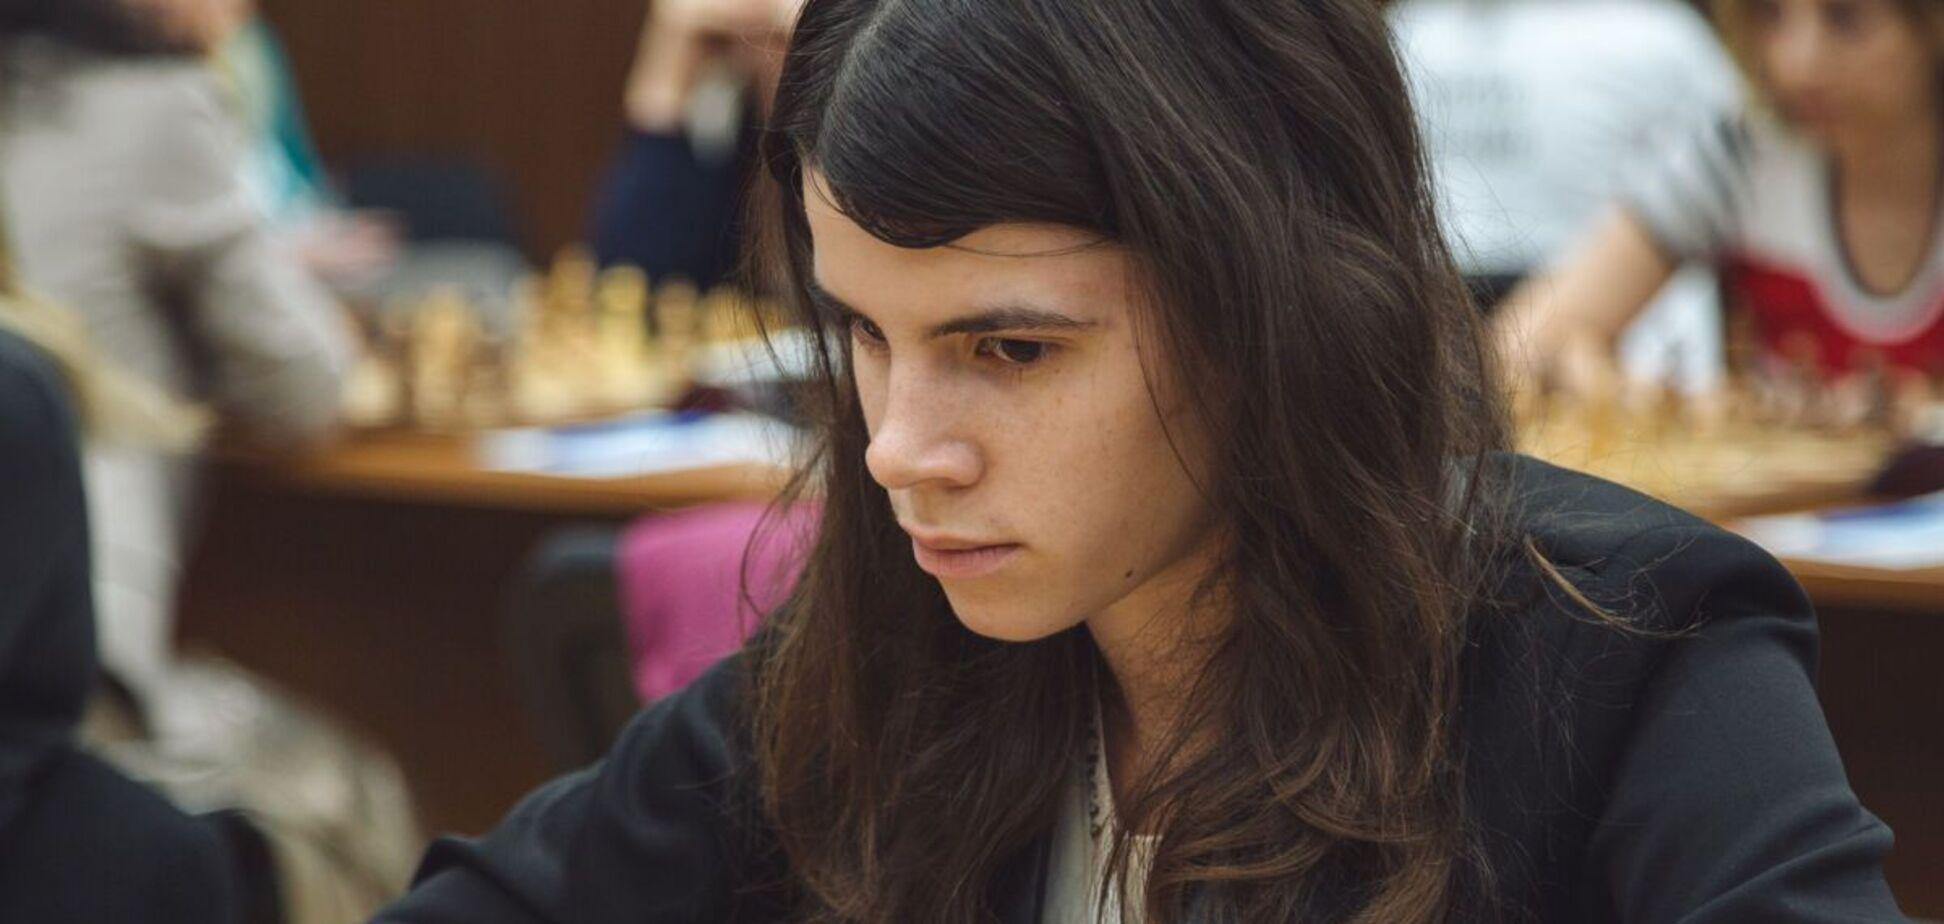 Юлия Осьмак